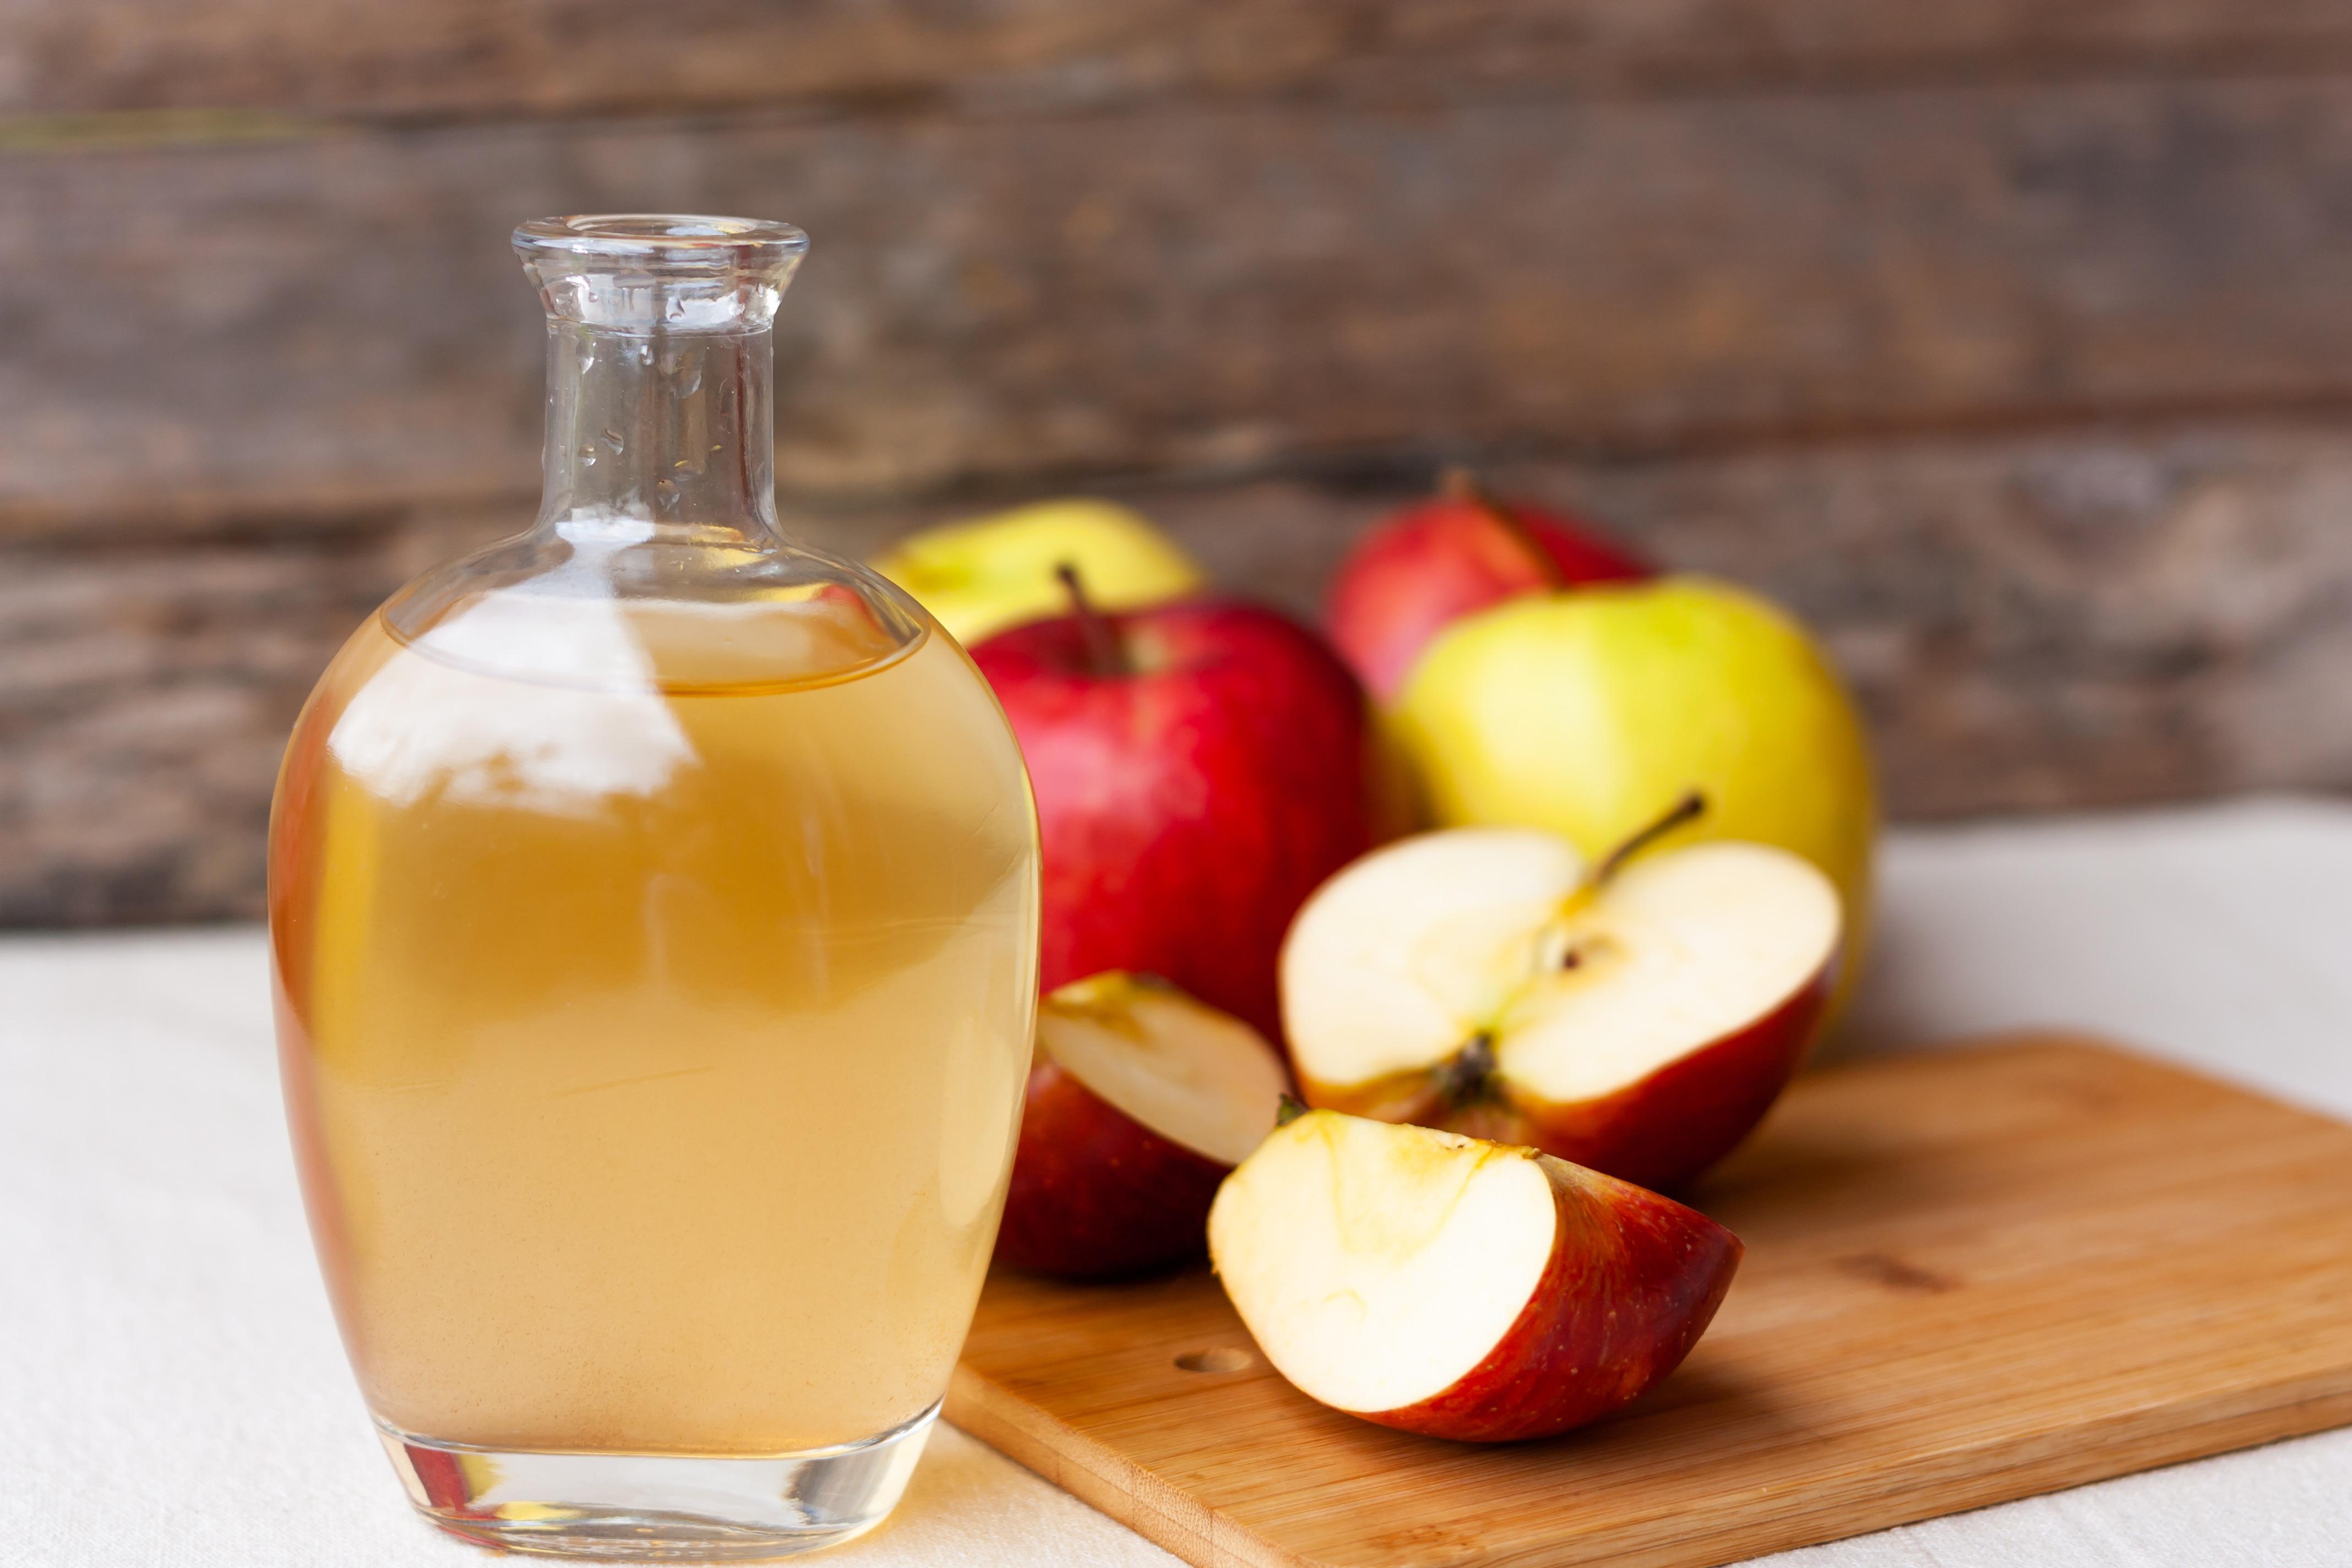 How To Drink Apple Cider Vinegar In The Morning | Holland & Barrett